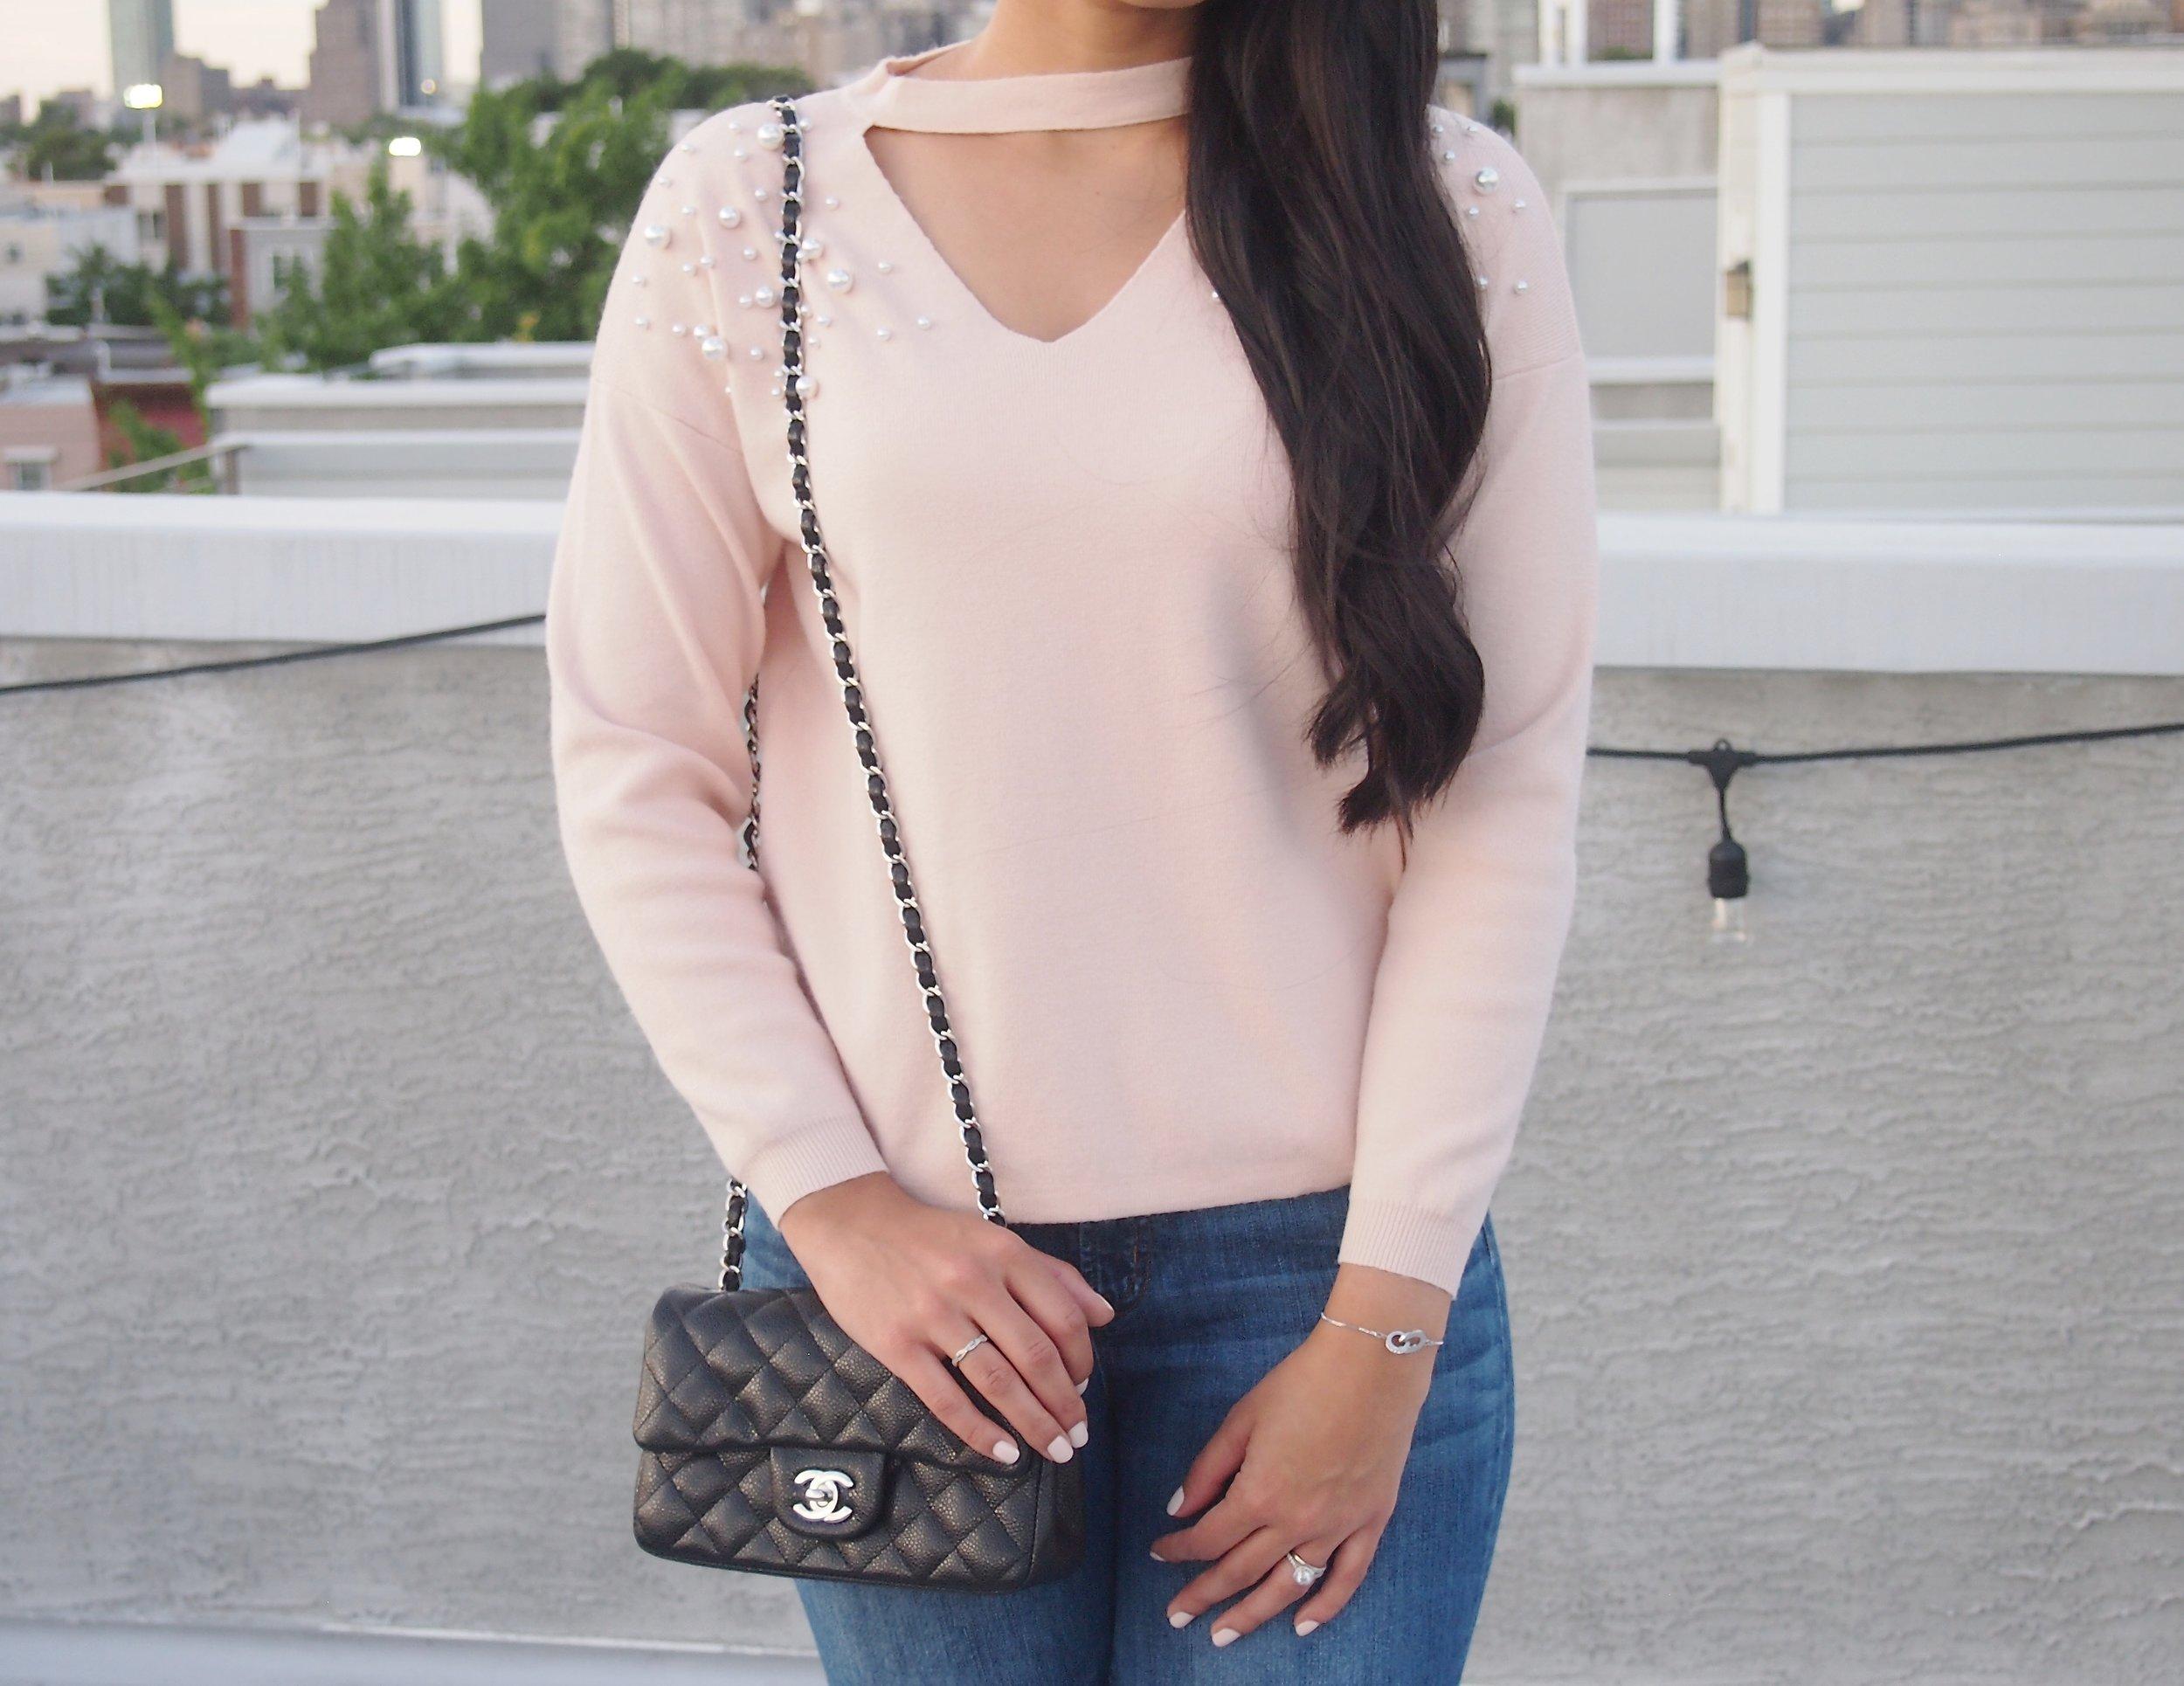 chicwish-sweater-details-fall-fashion.jpg